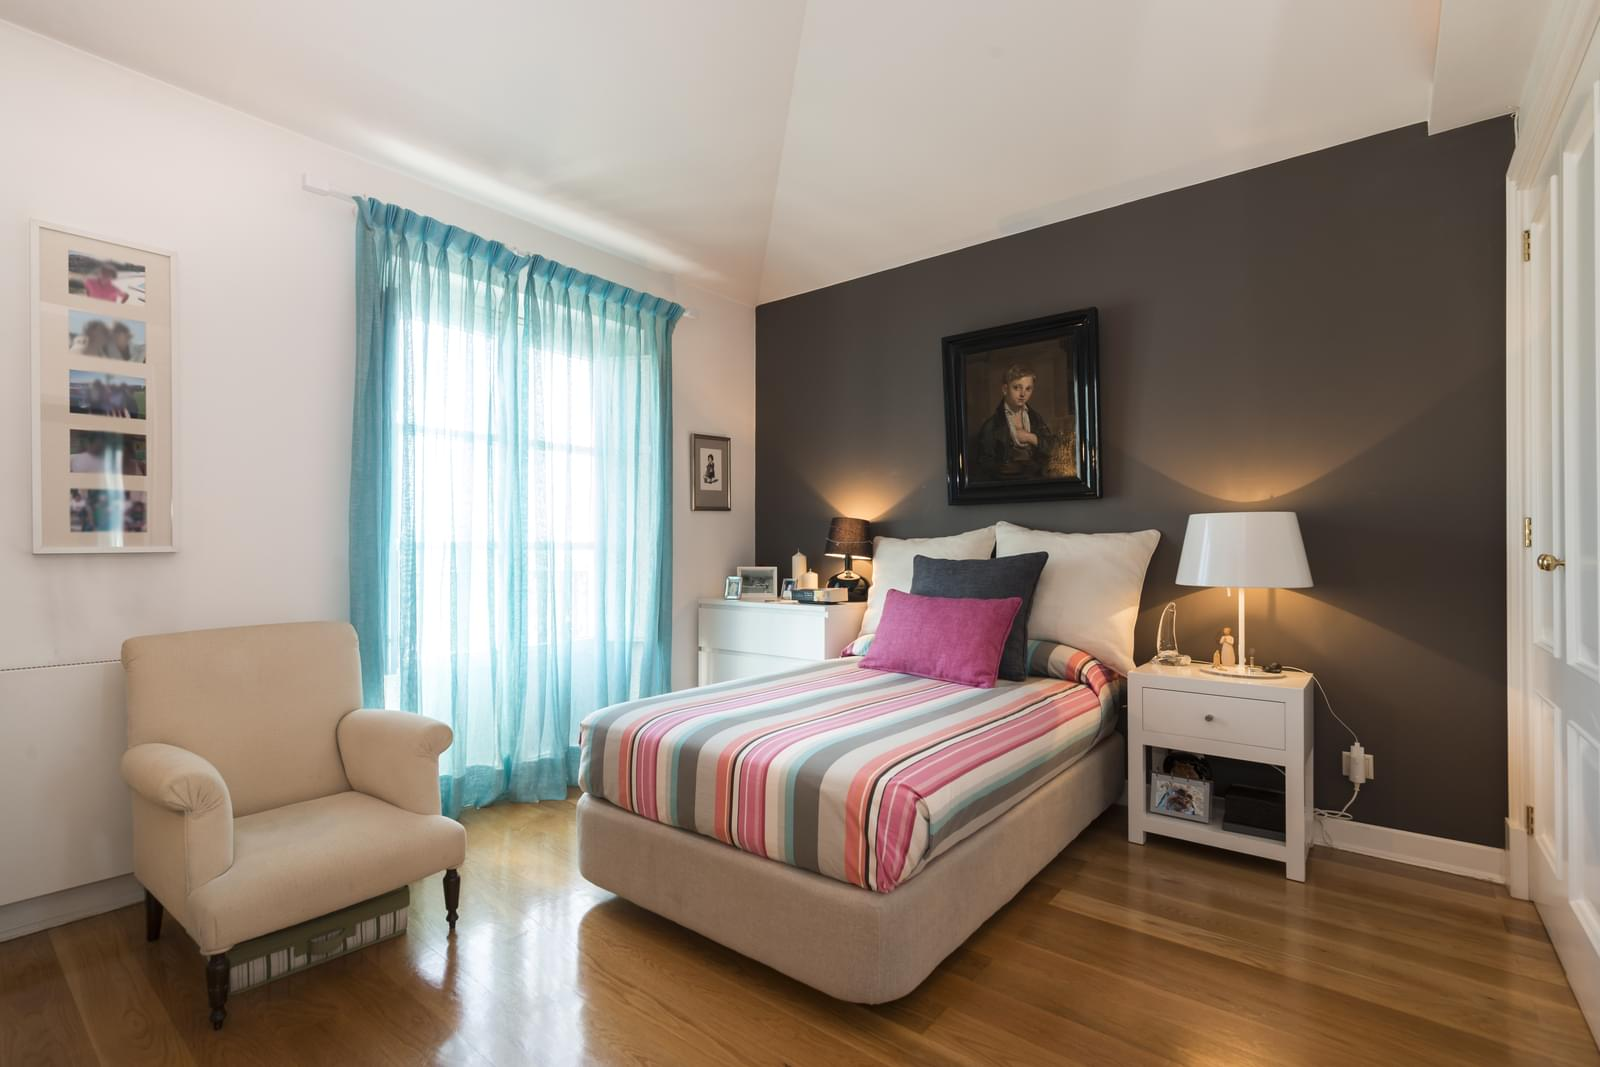 pf18618-apartamento-t4-lisboa-b9180d23-0927-4fee-94b1-6d74cbabd964